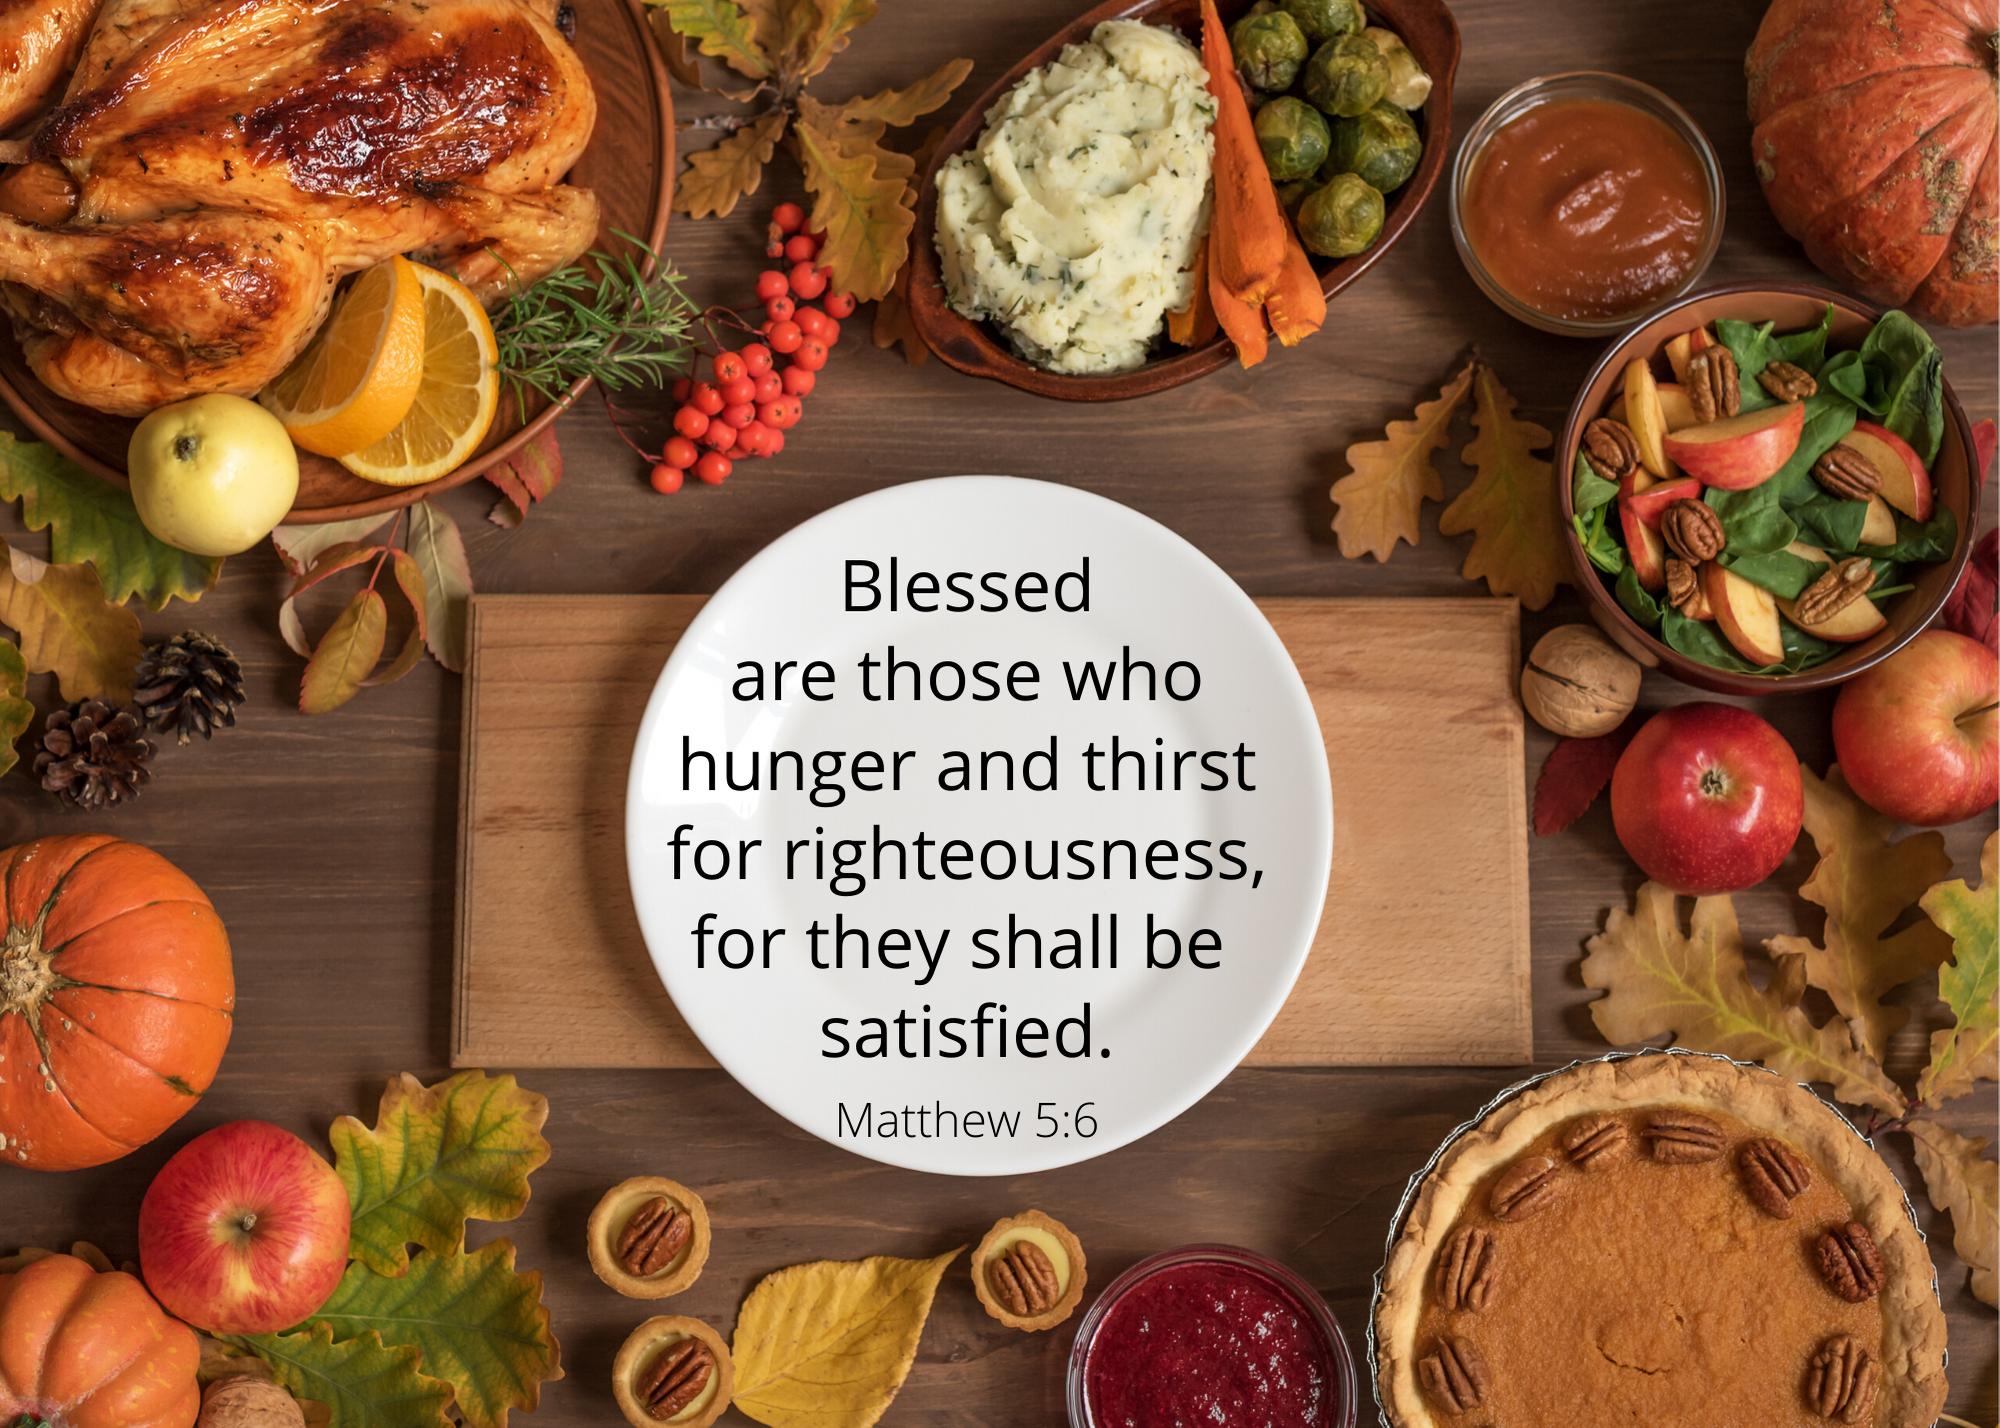 Matthew 5 6